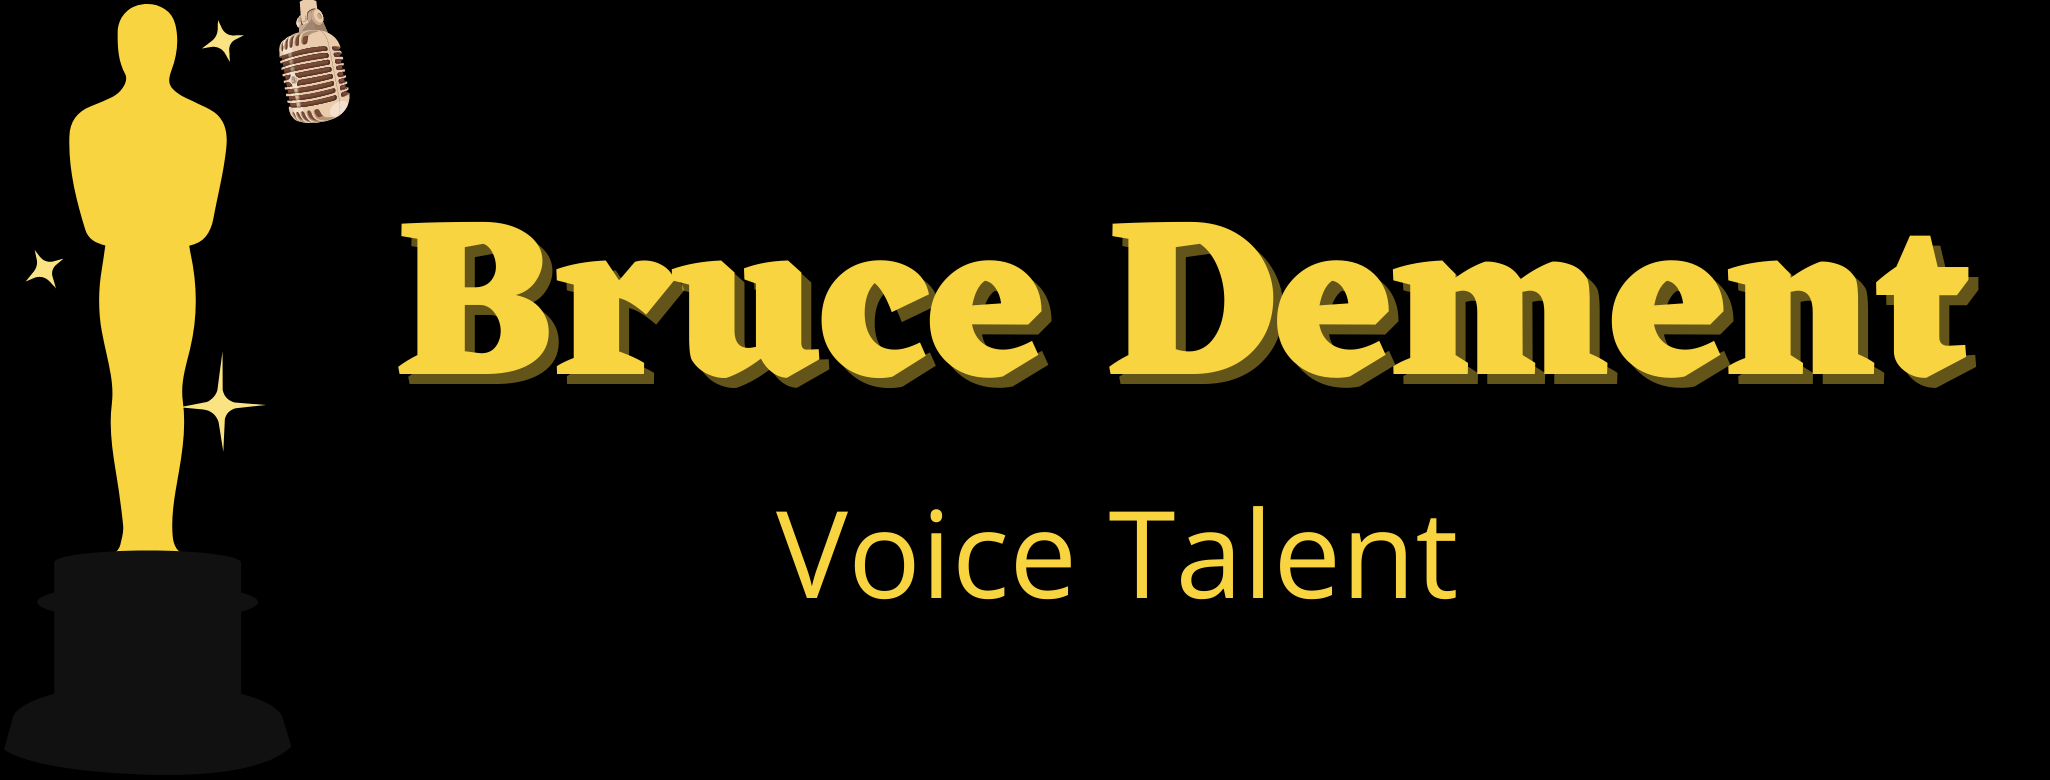 Bruce Dement